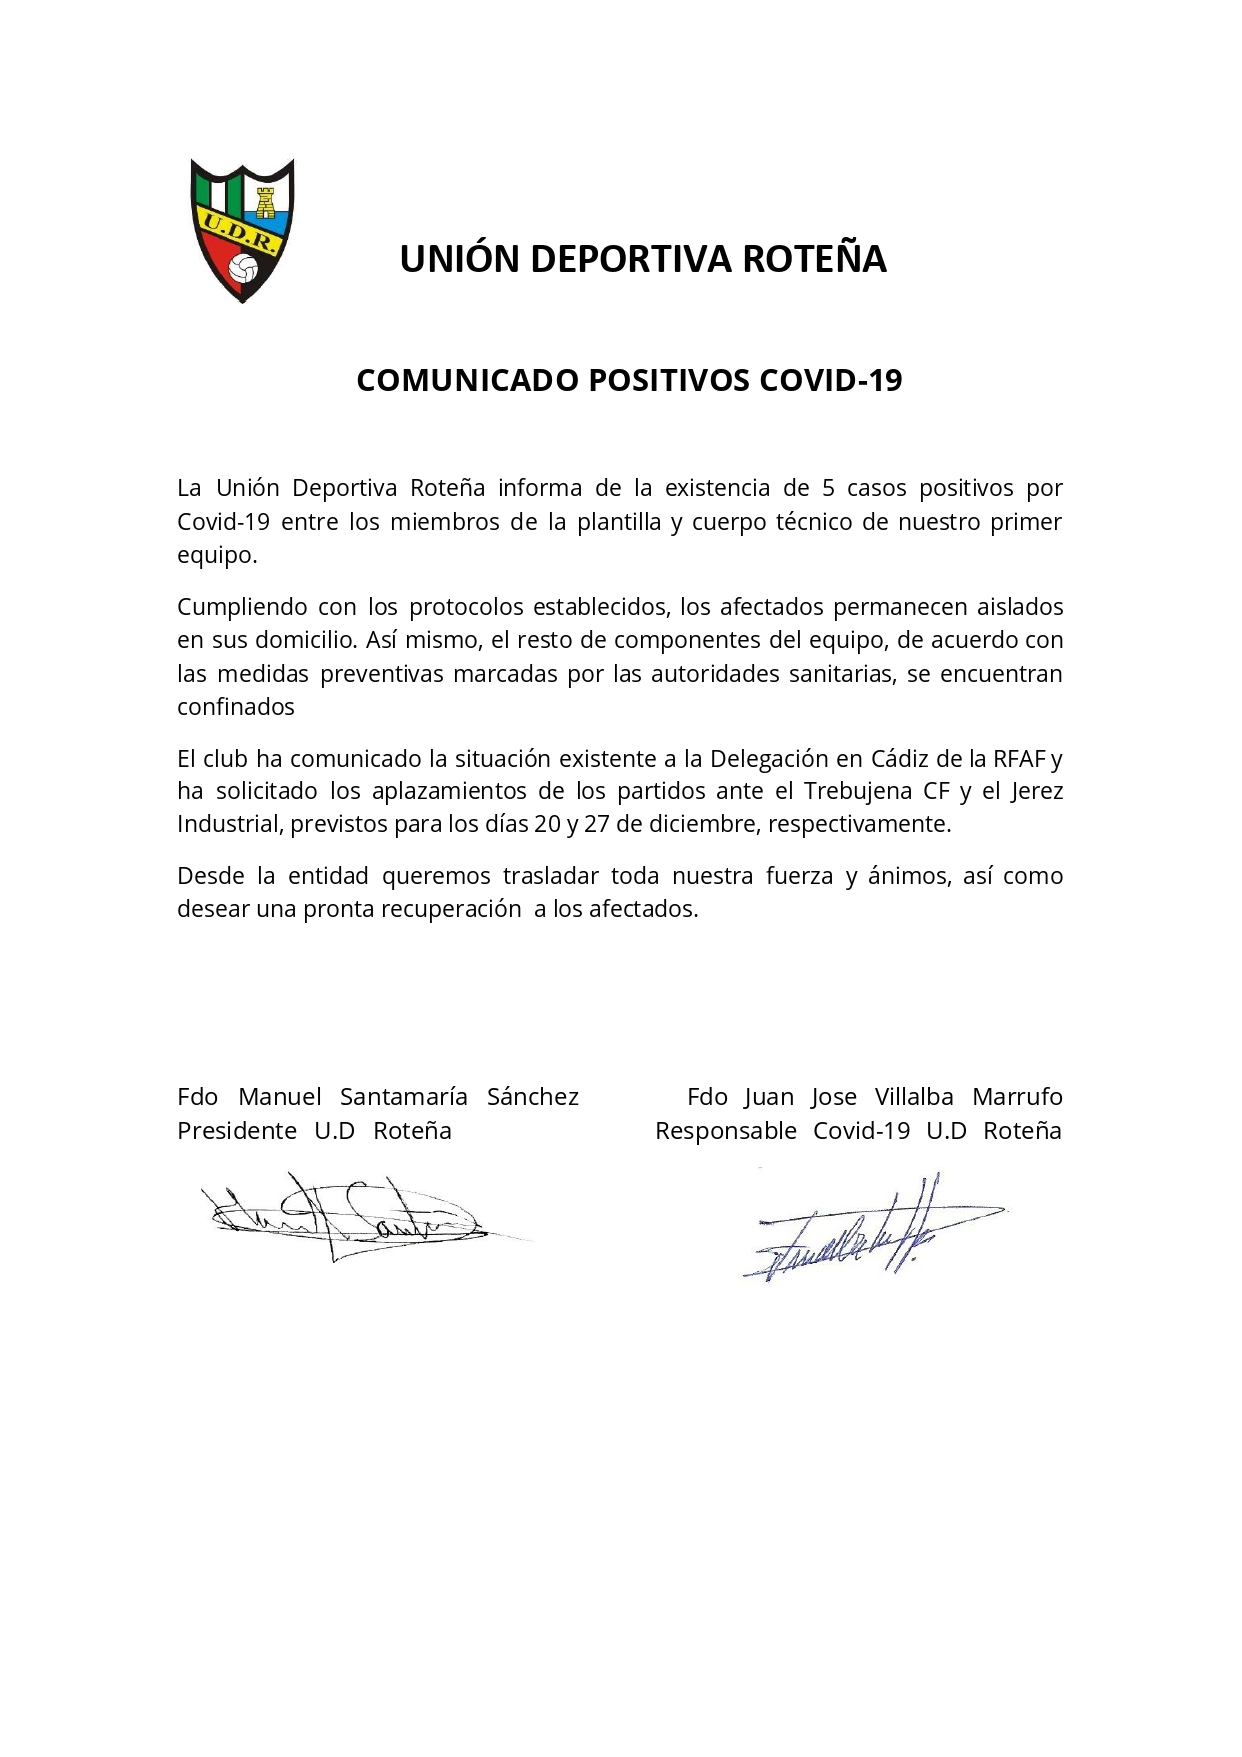 Comunicado positivos Covid-19